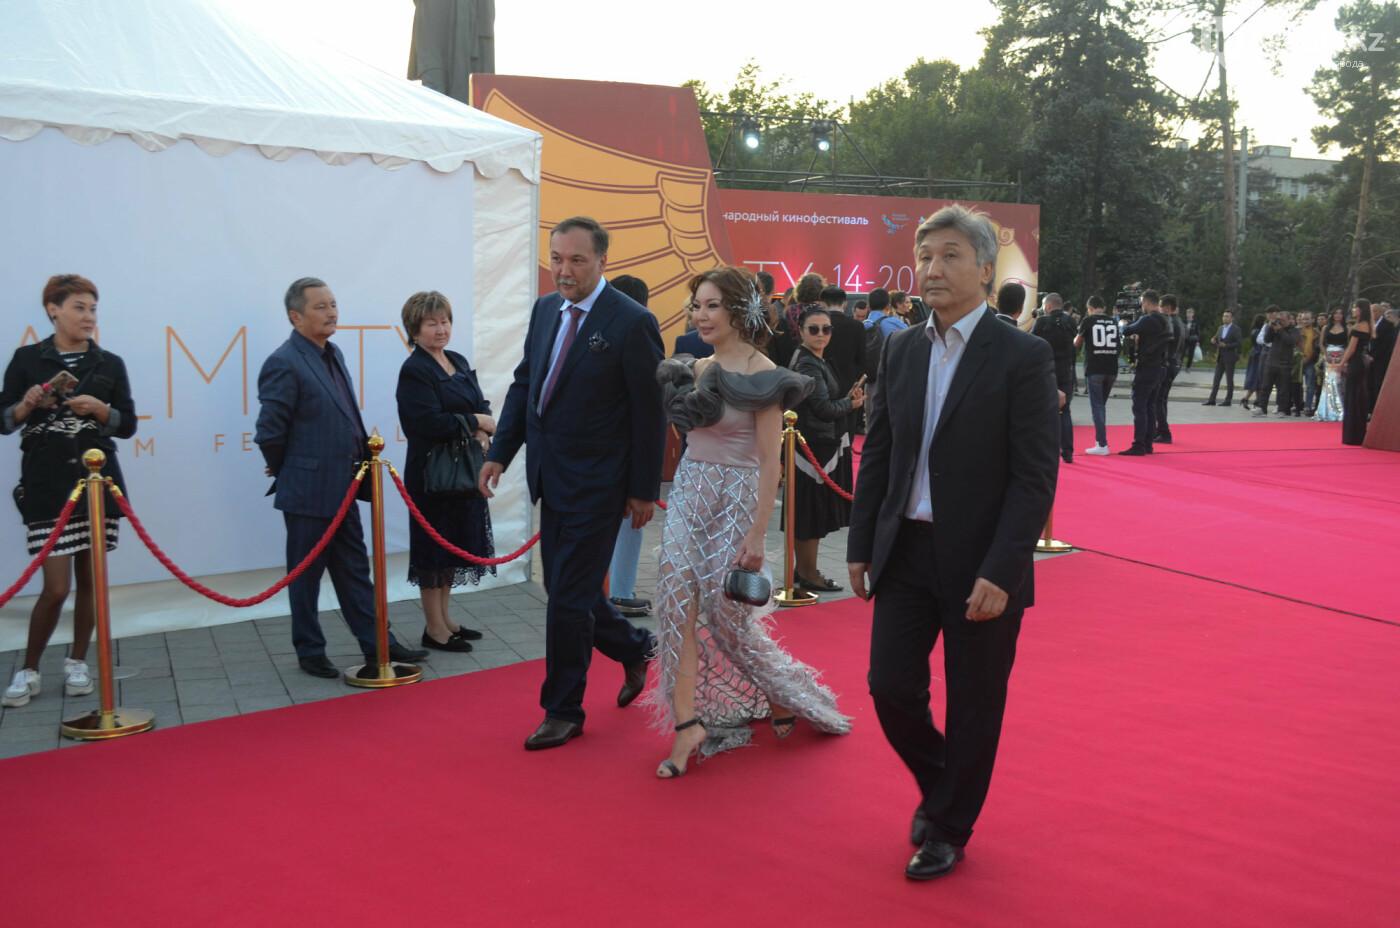 Второй Almaty Film Festival открылся фильмом «Тайна печати дракона» (фото), фото-7